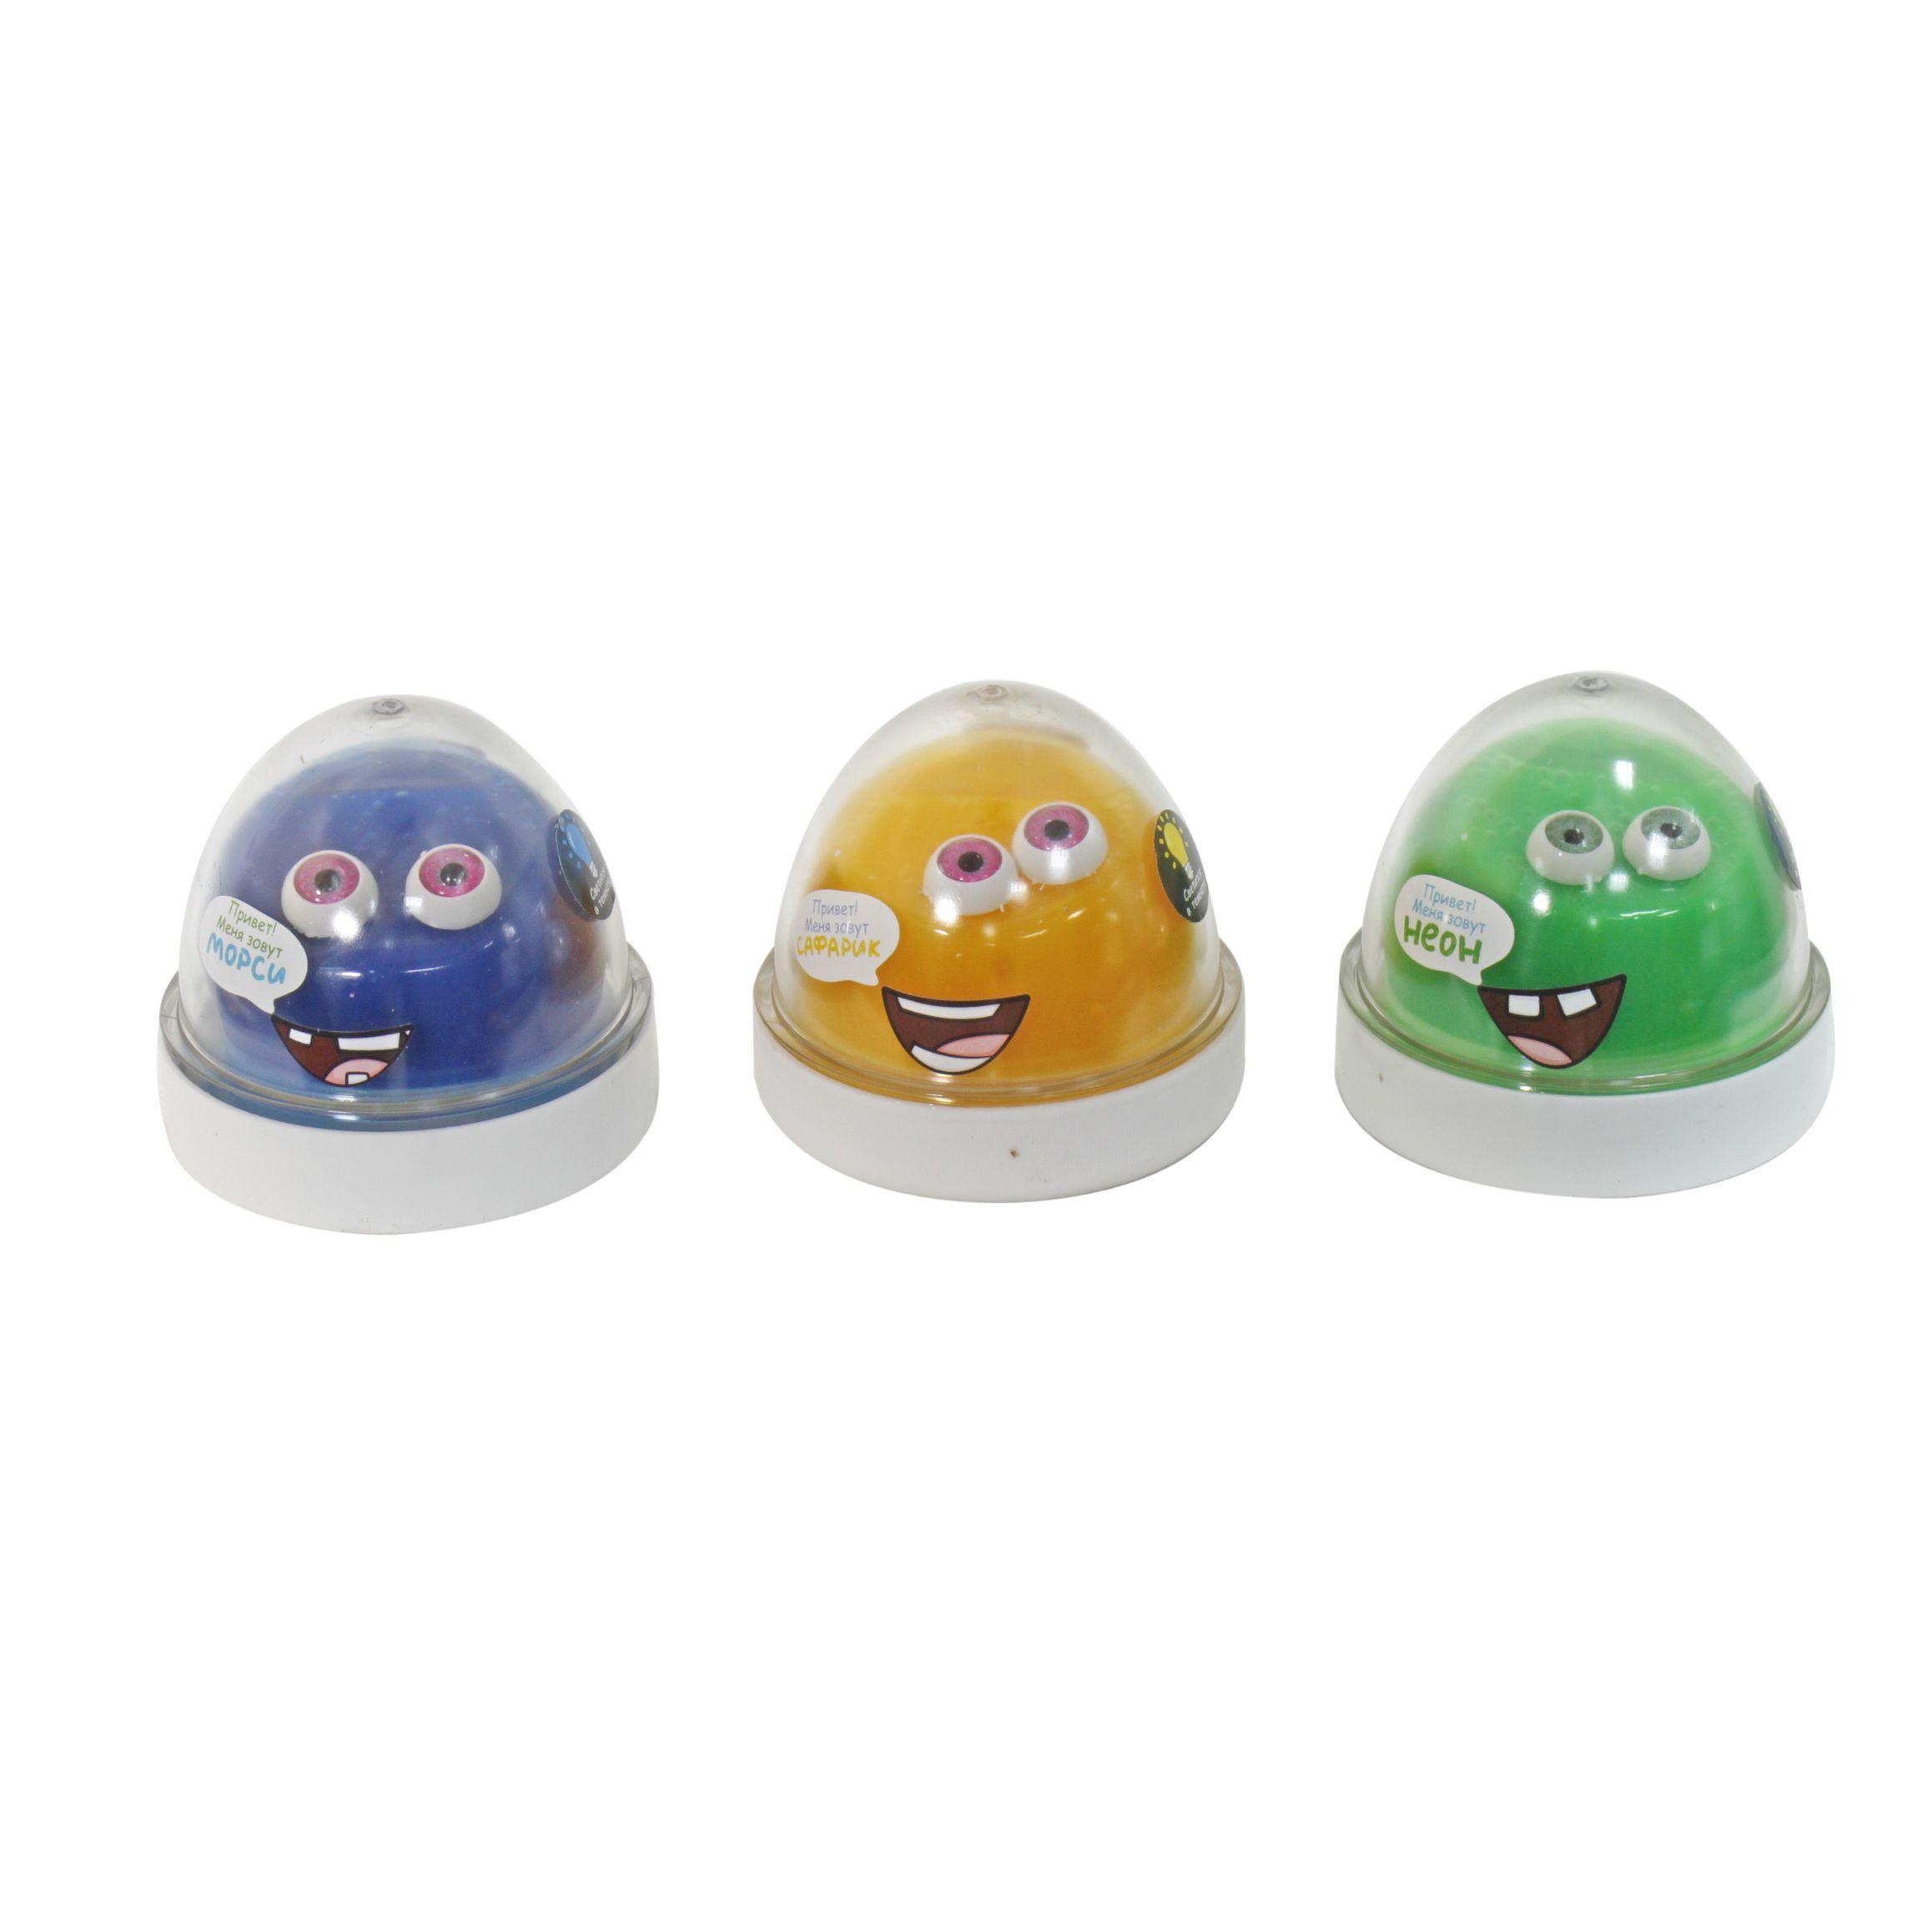 Жвачка для рук-антистресс Nano Gum - Monsters